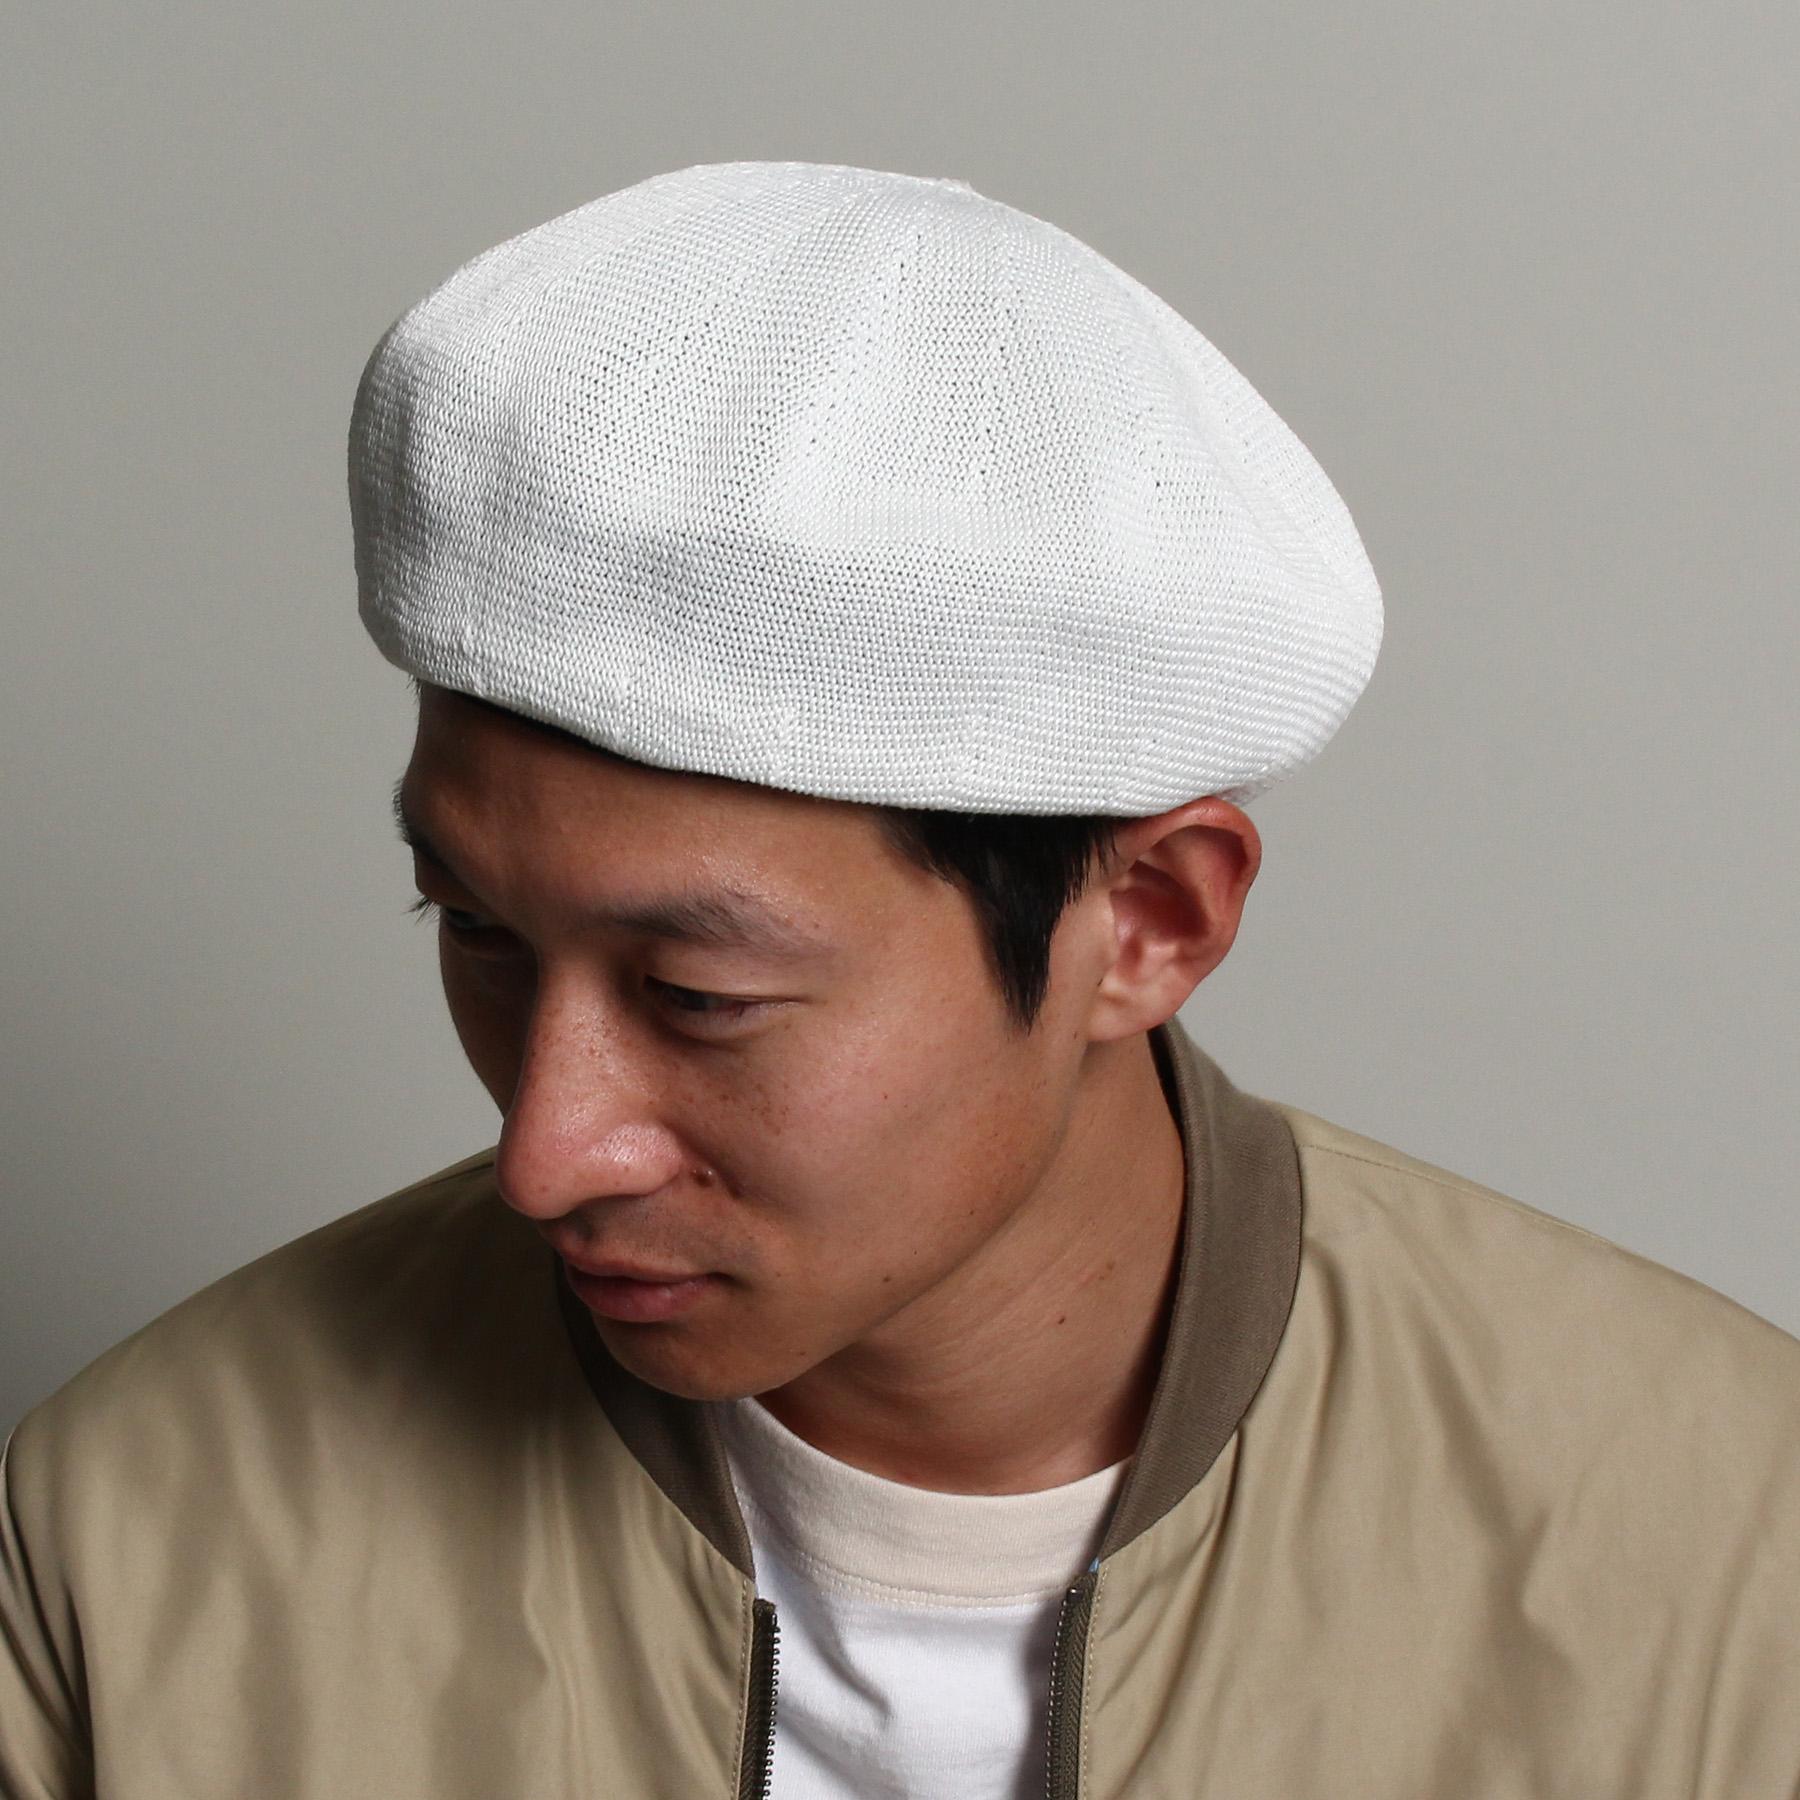 【THE SHOP TK(Men) (ザ ショップ ティーケー(メンズ))】サーモベレーメンズ 帽子|ハンチング・ベレー帽 オフホワイト